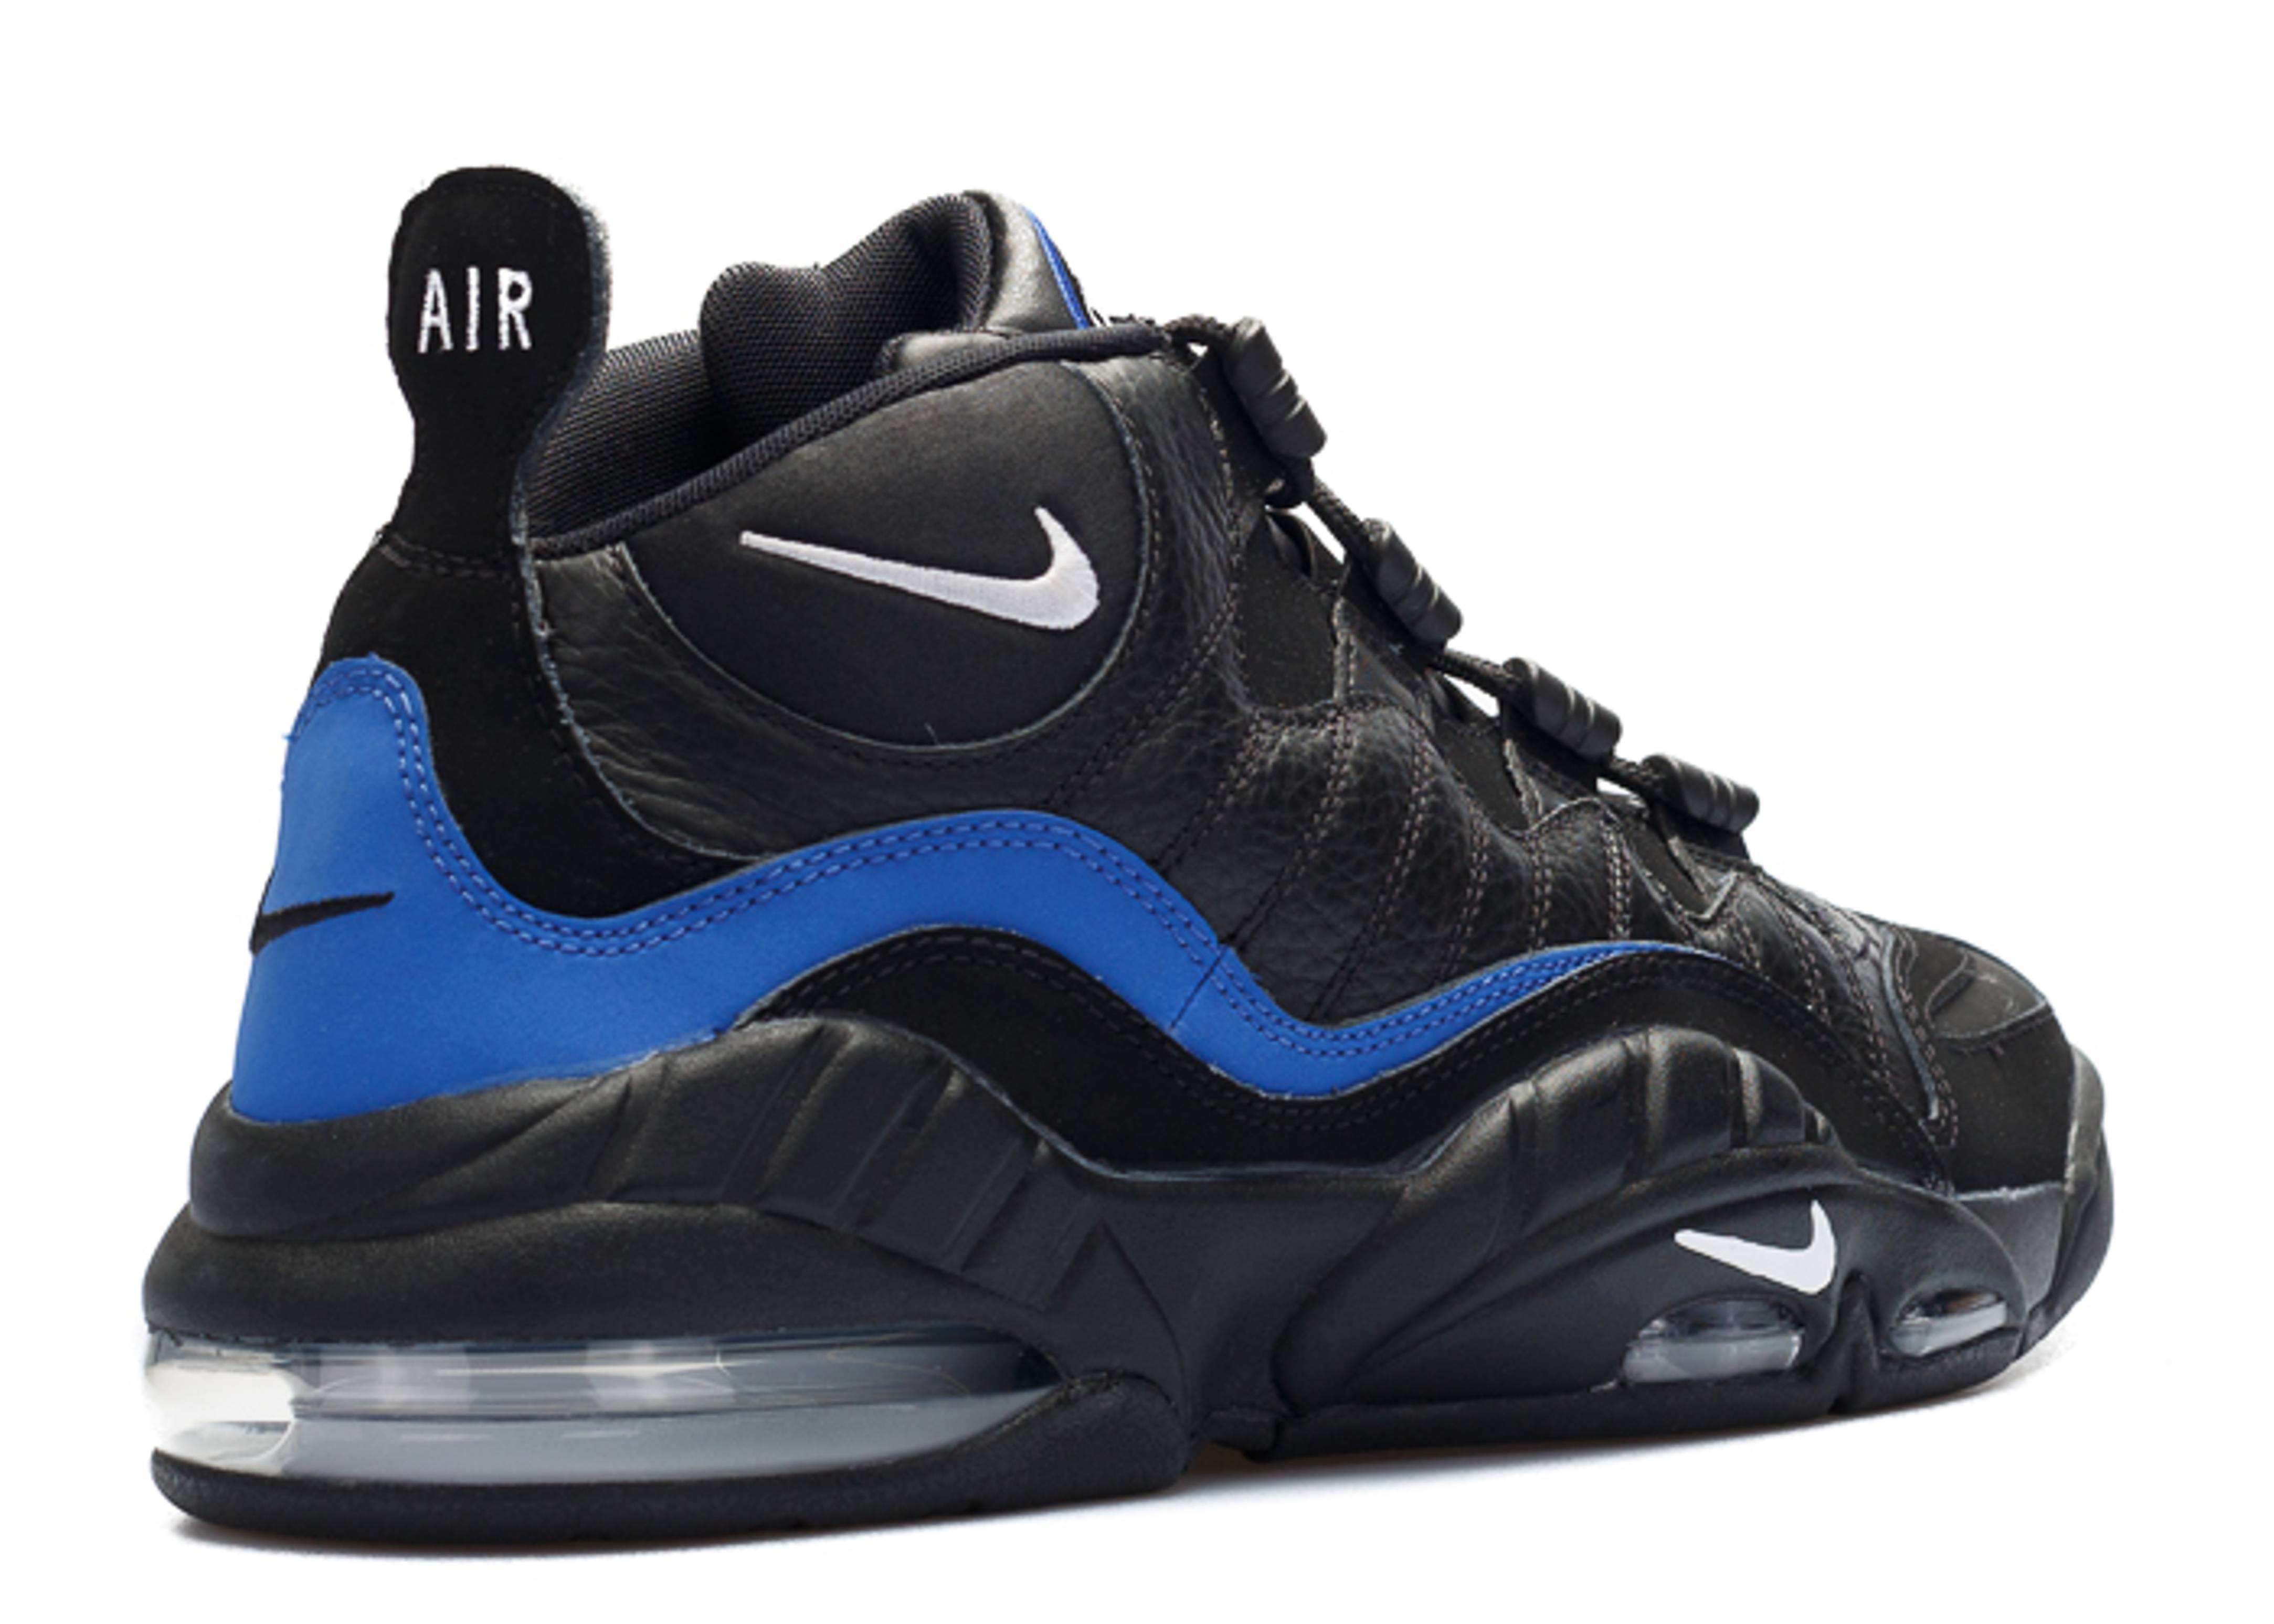 Vintage Nike Schuhe Chris Webber